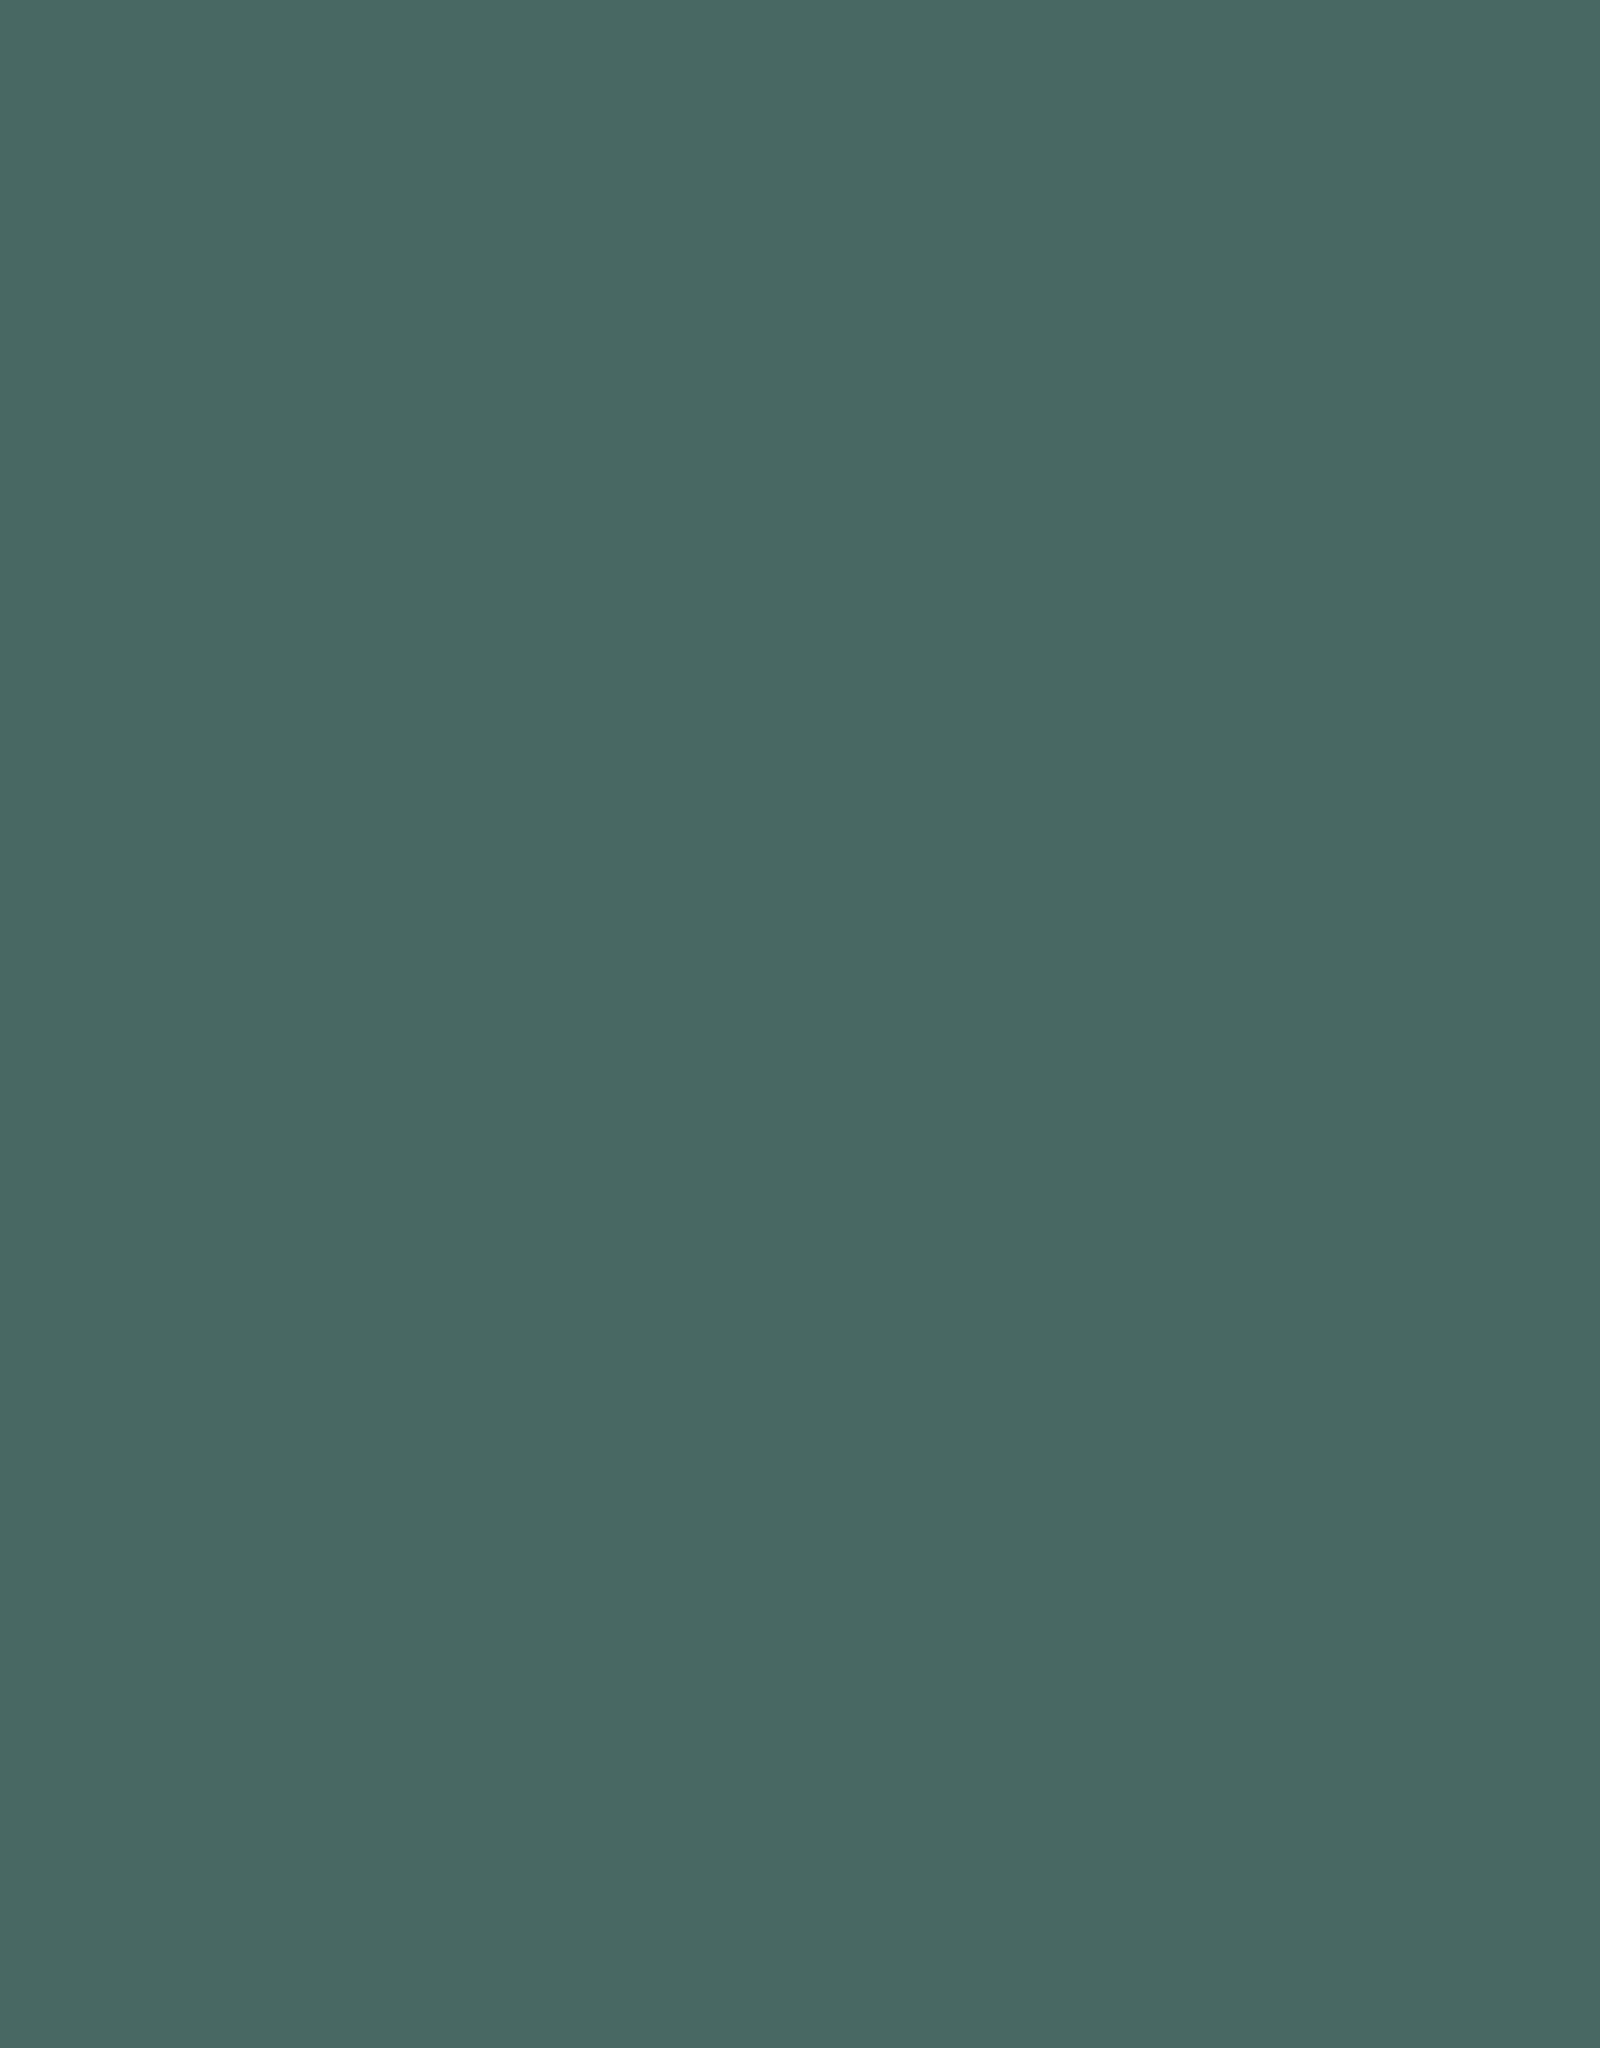 Sennelier, Extra Fine Soft Pastel, Leaf Green